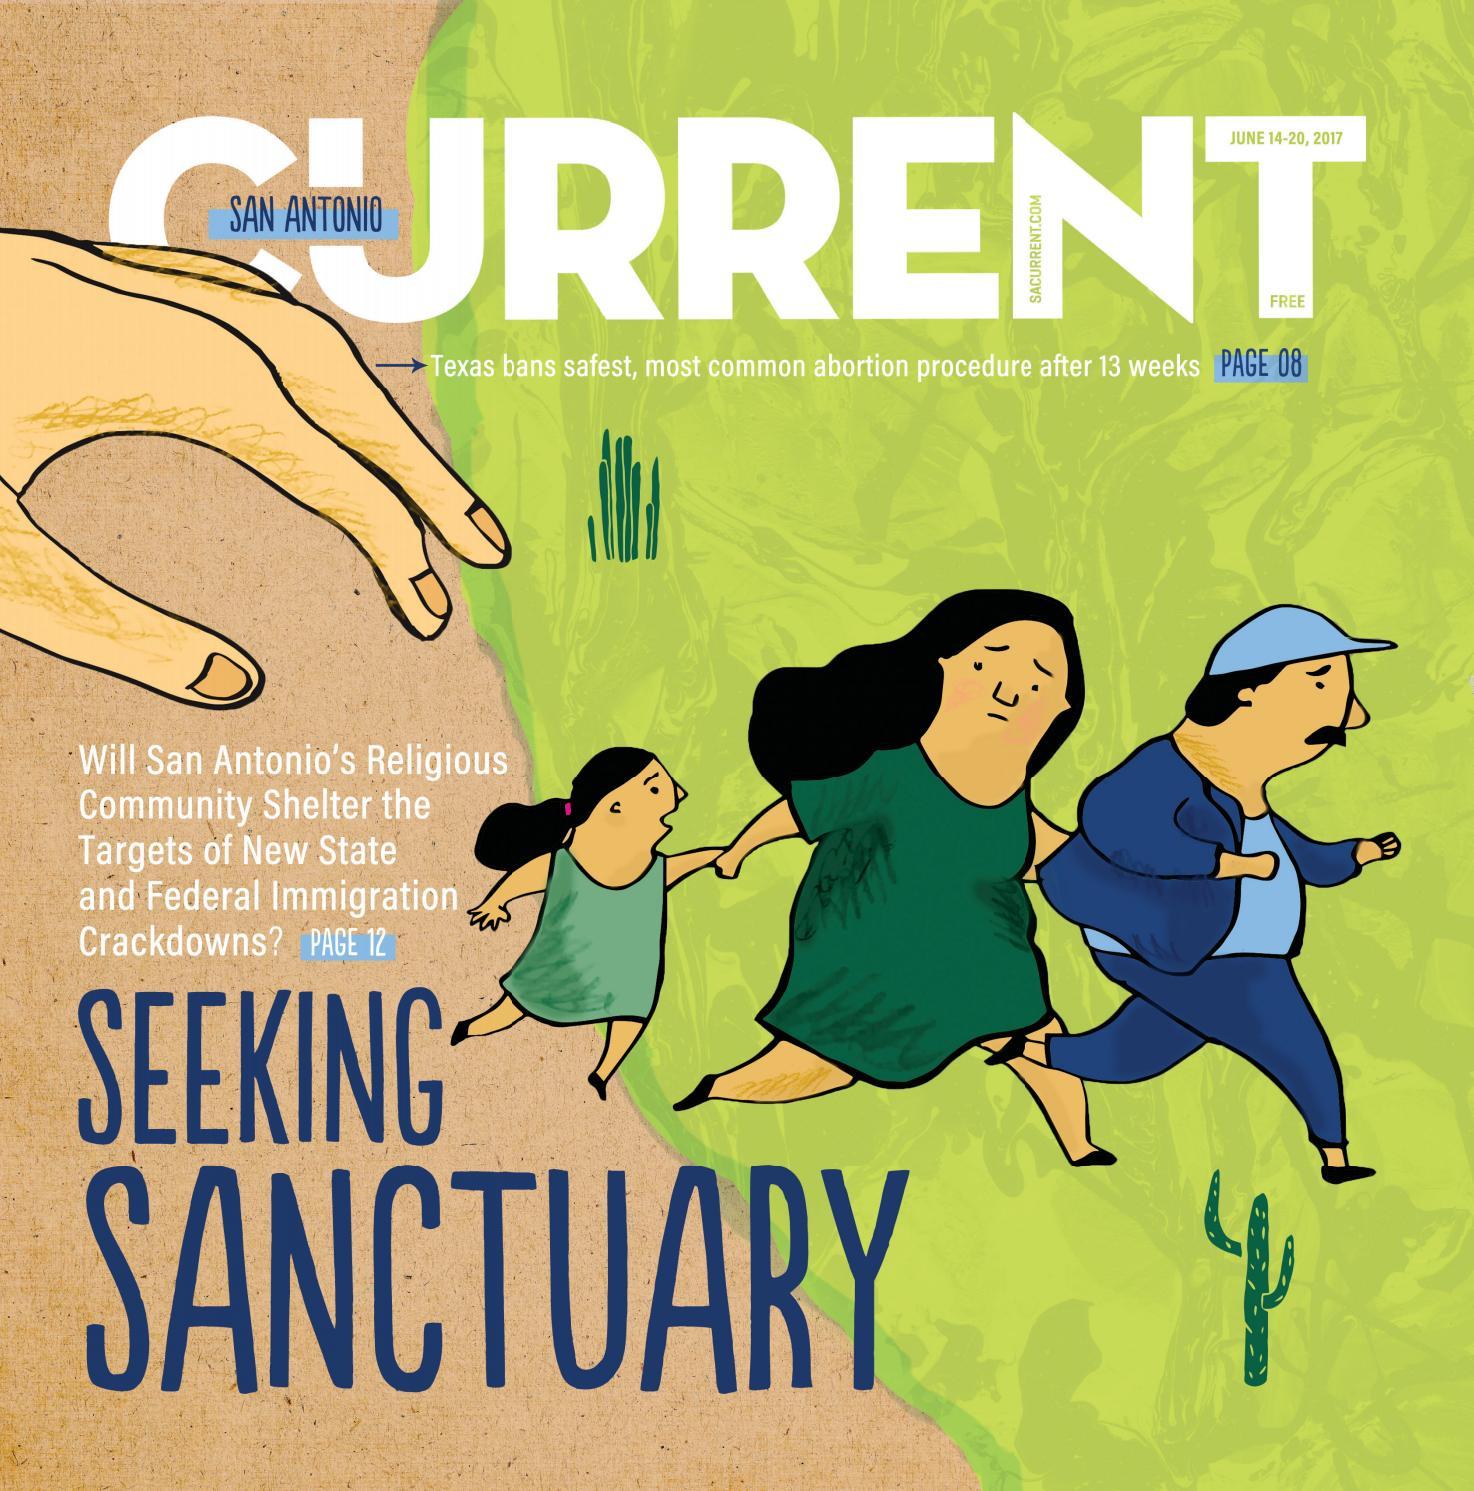 San Antonio Current - June 14, 2017 by Euclid Media Group - issuu